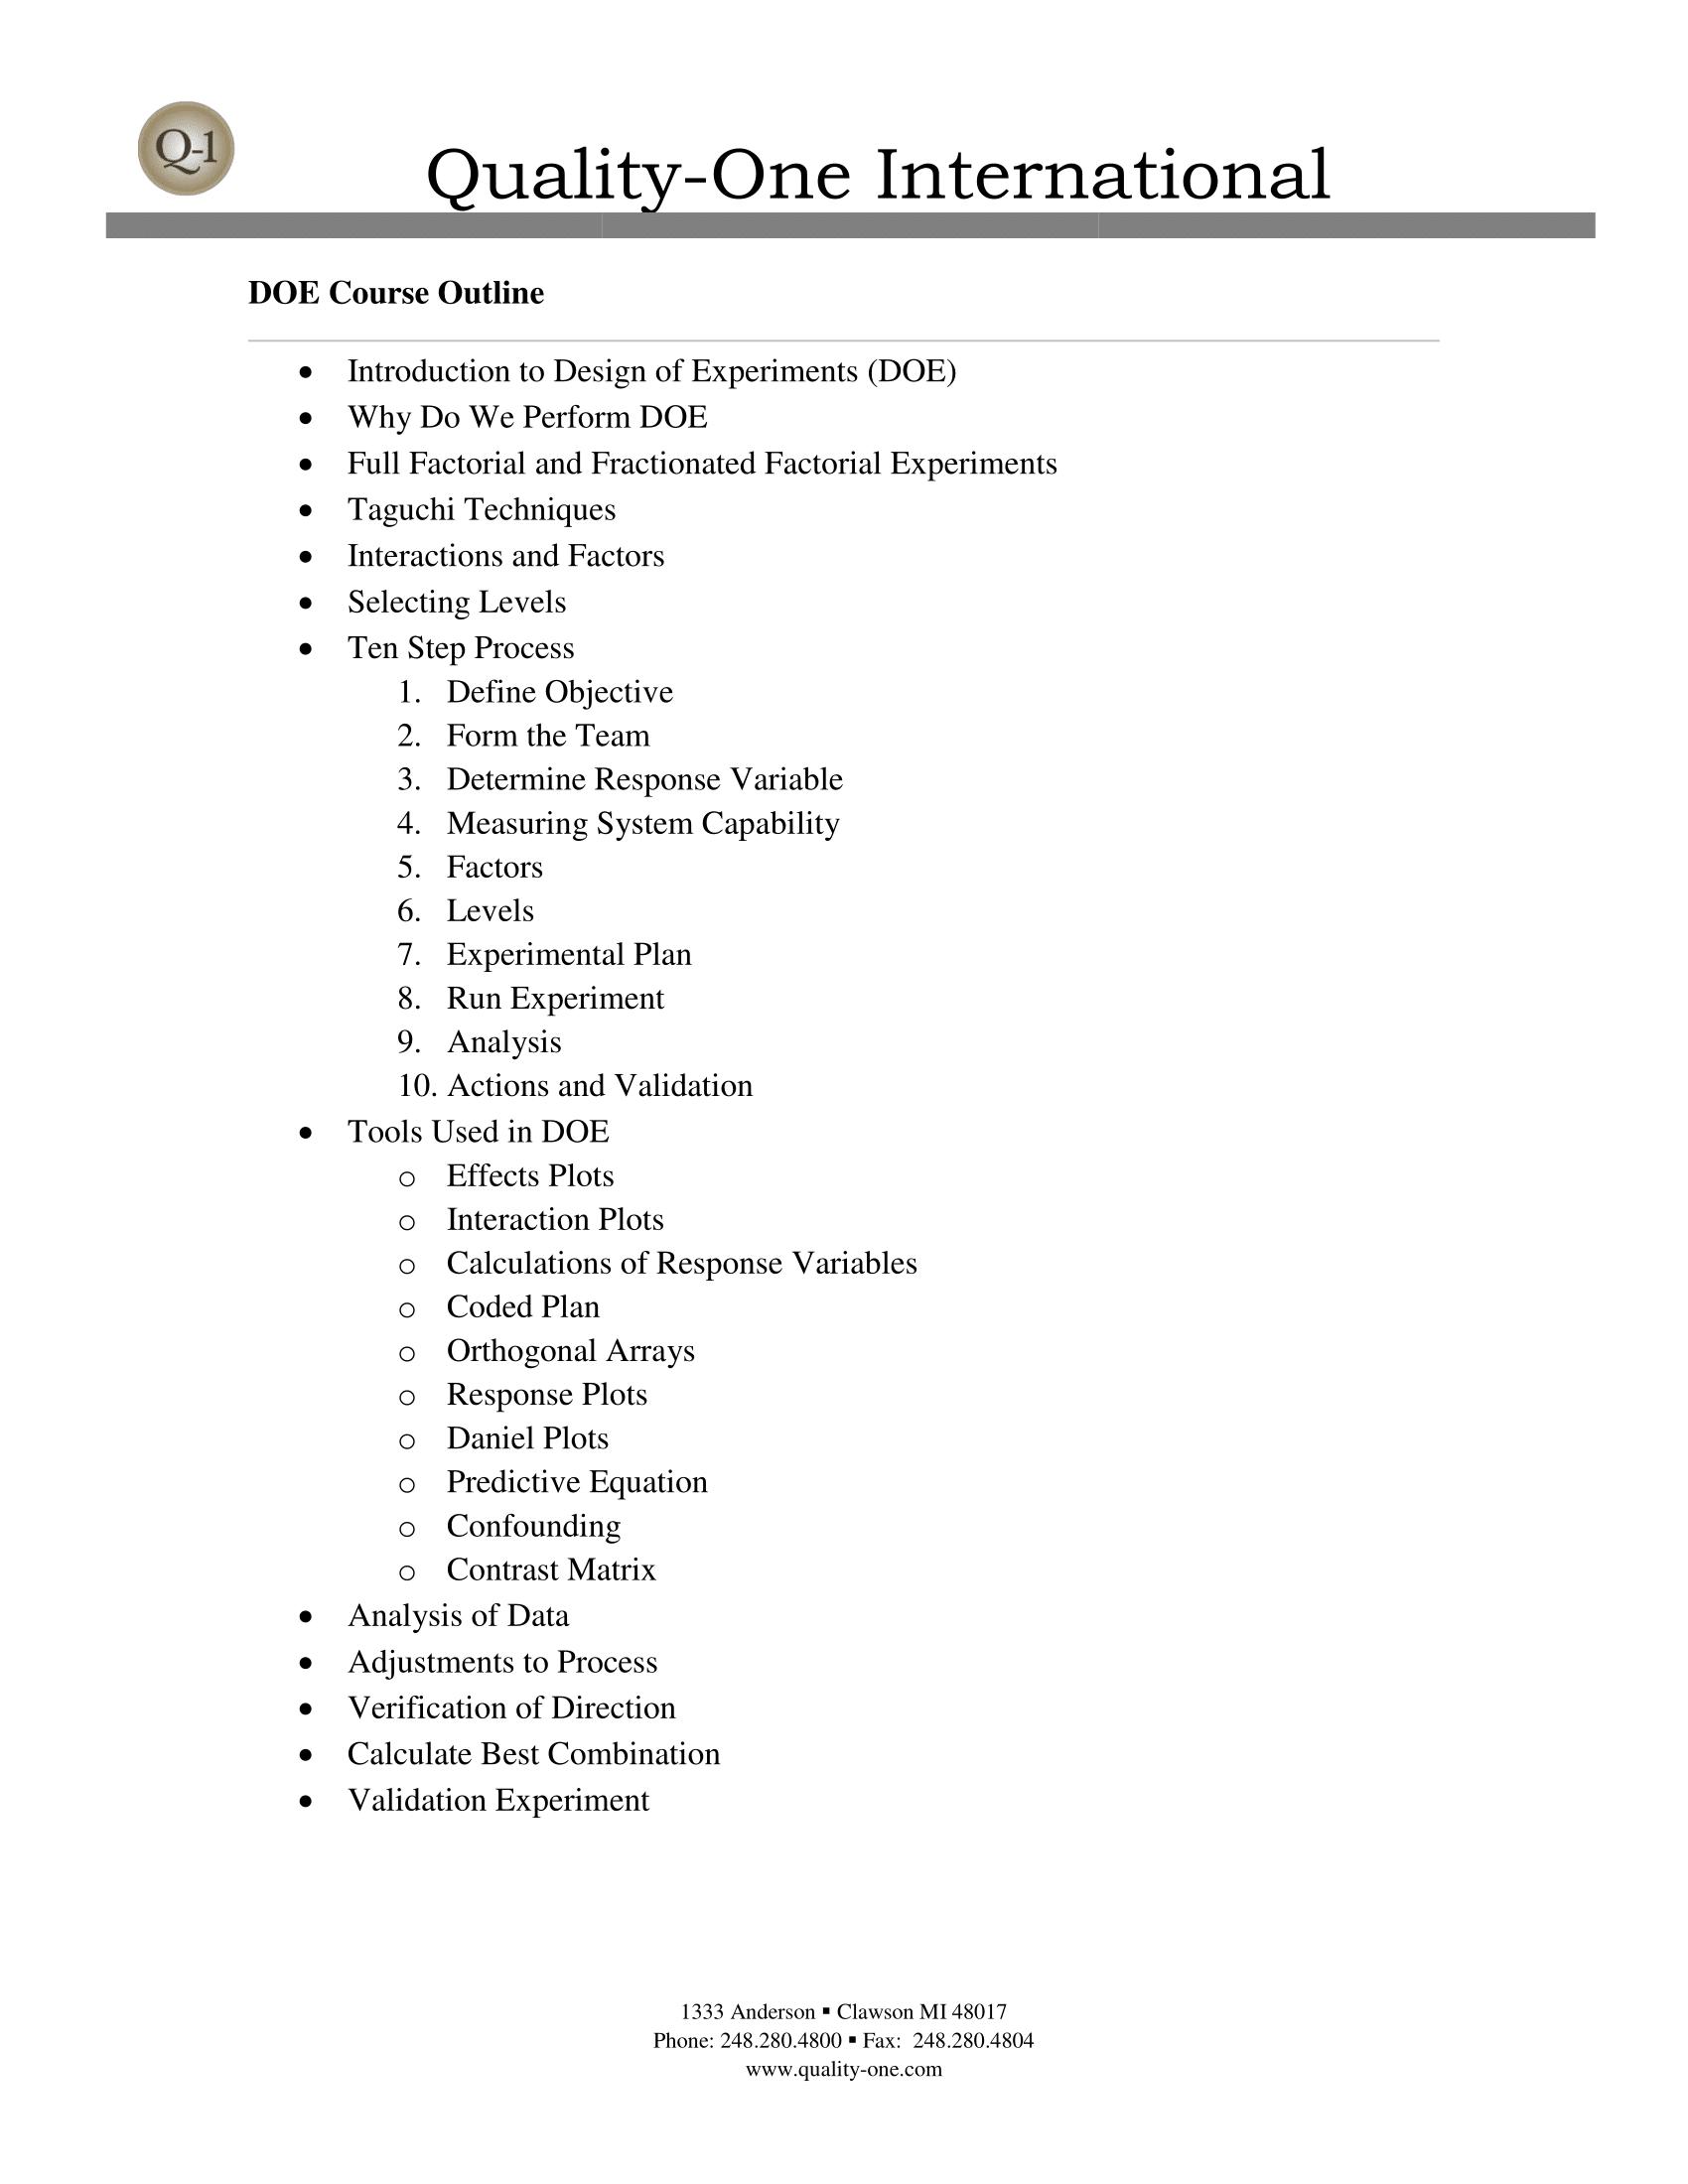 DOE Training Course Outline